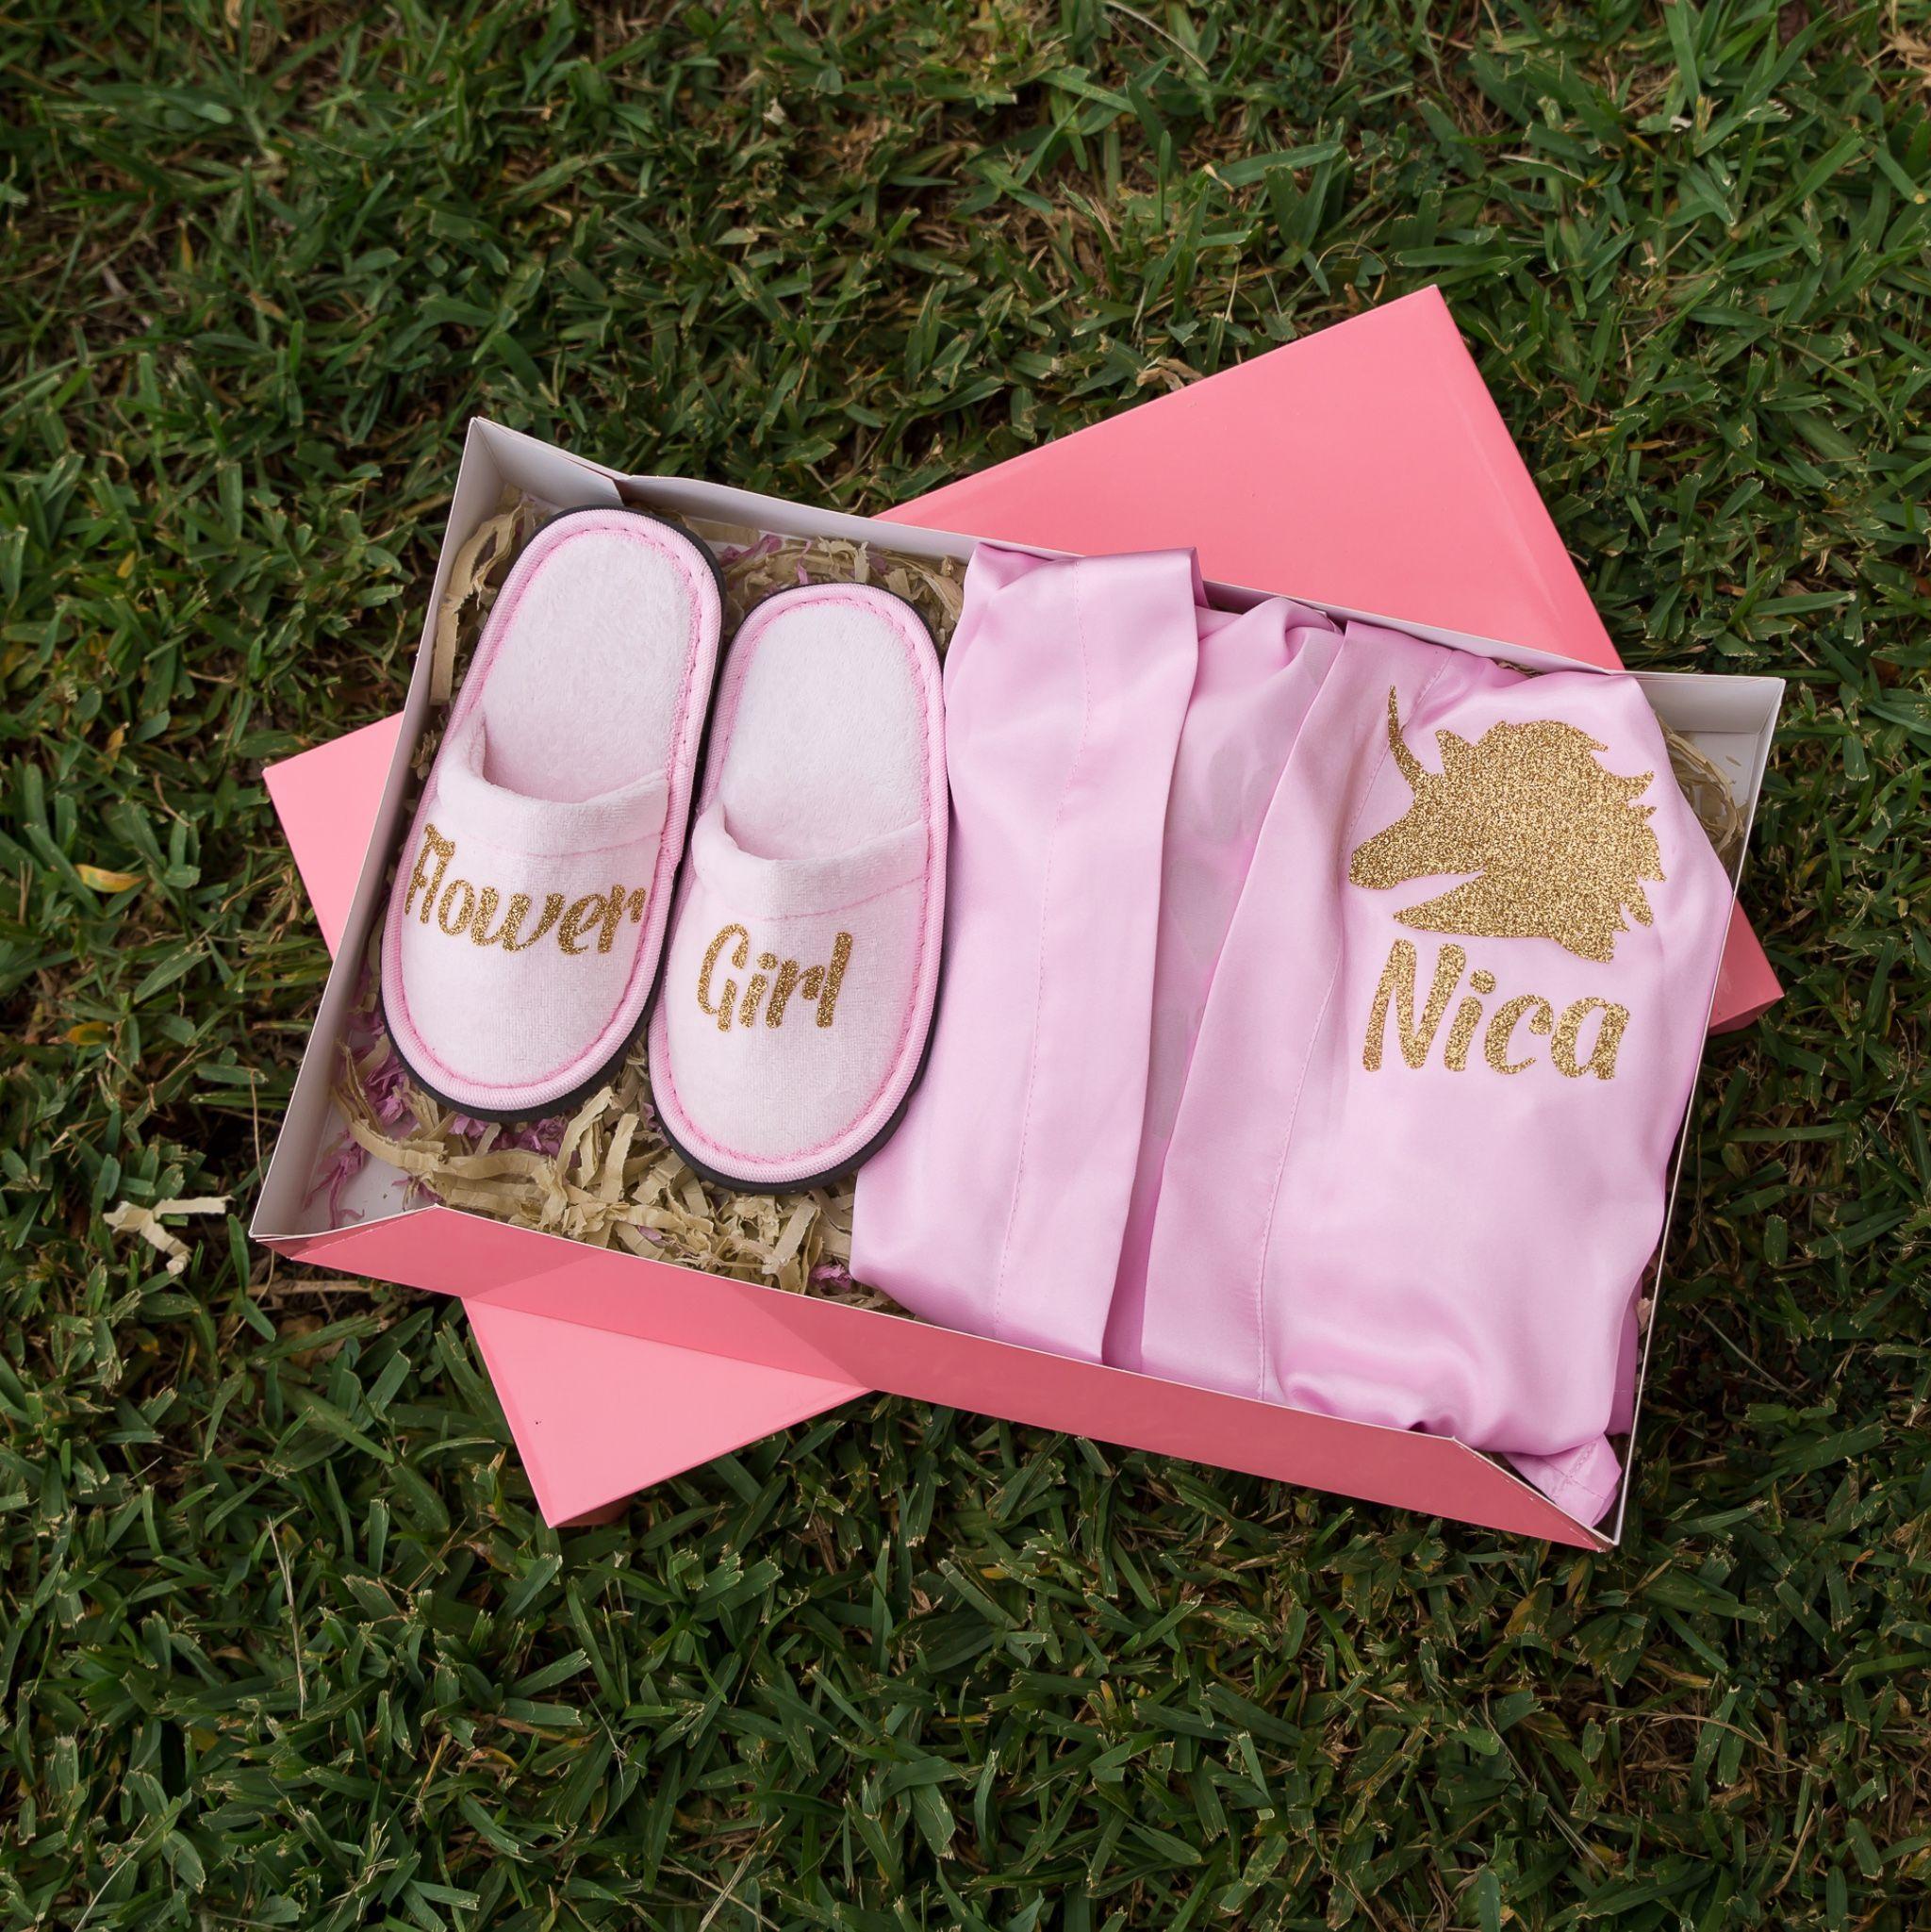 Flower girl gift box cute bridesmaids gifts bridesmaid